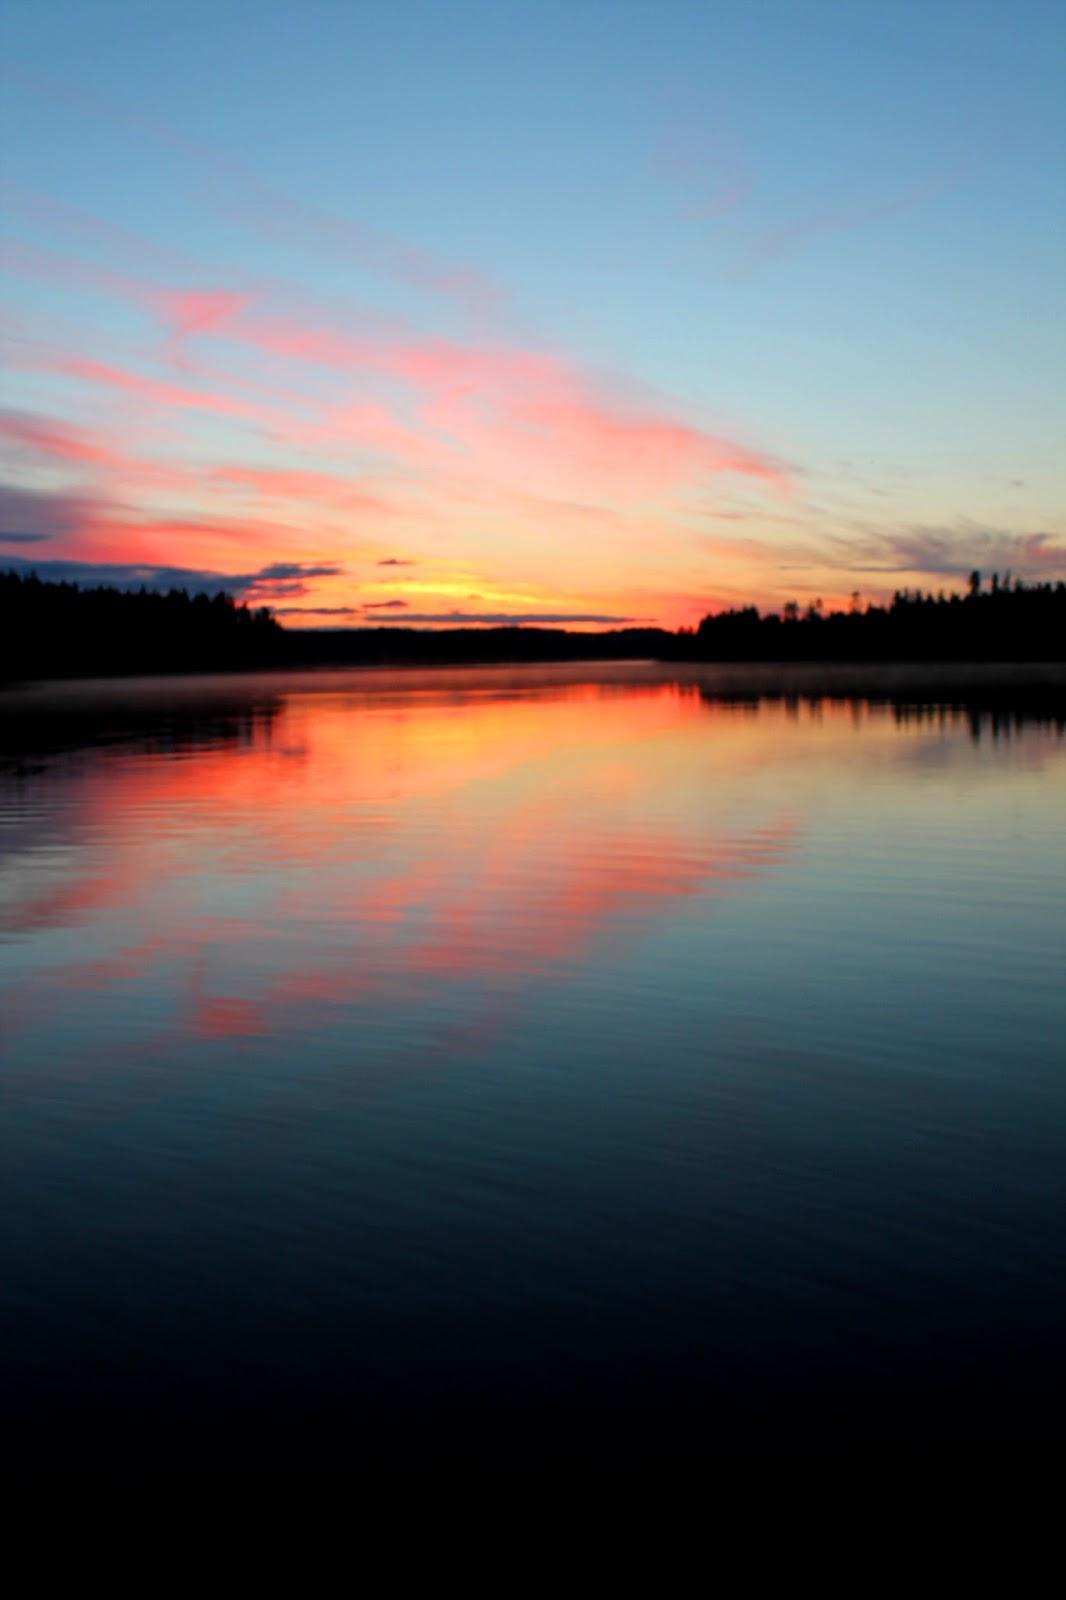 #sky #colors #colours #sun #sunset #sunrise #lake #sea #cost #forest